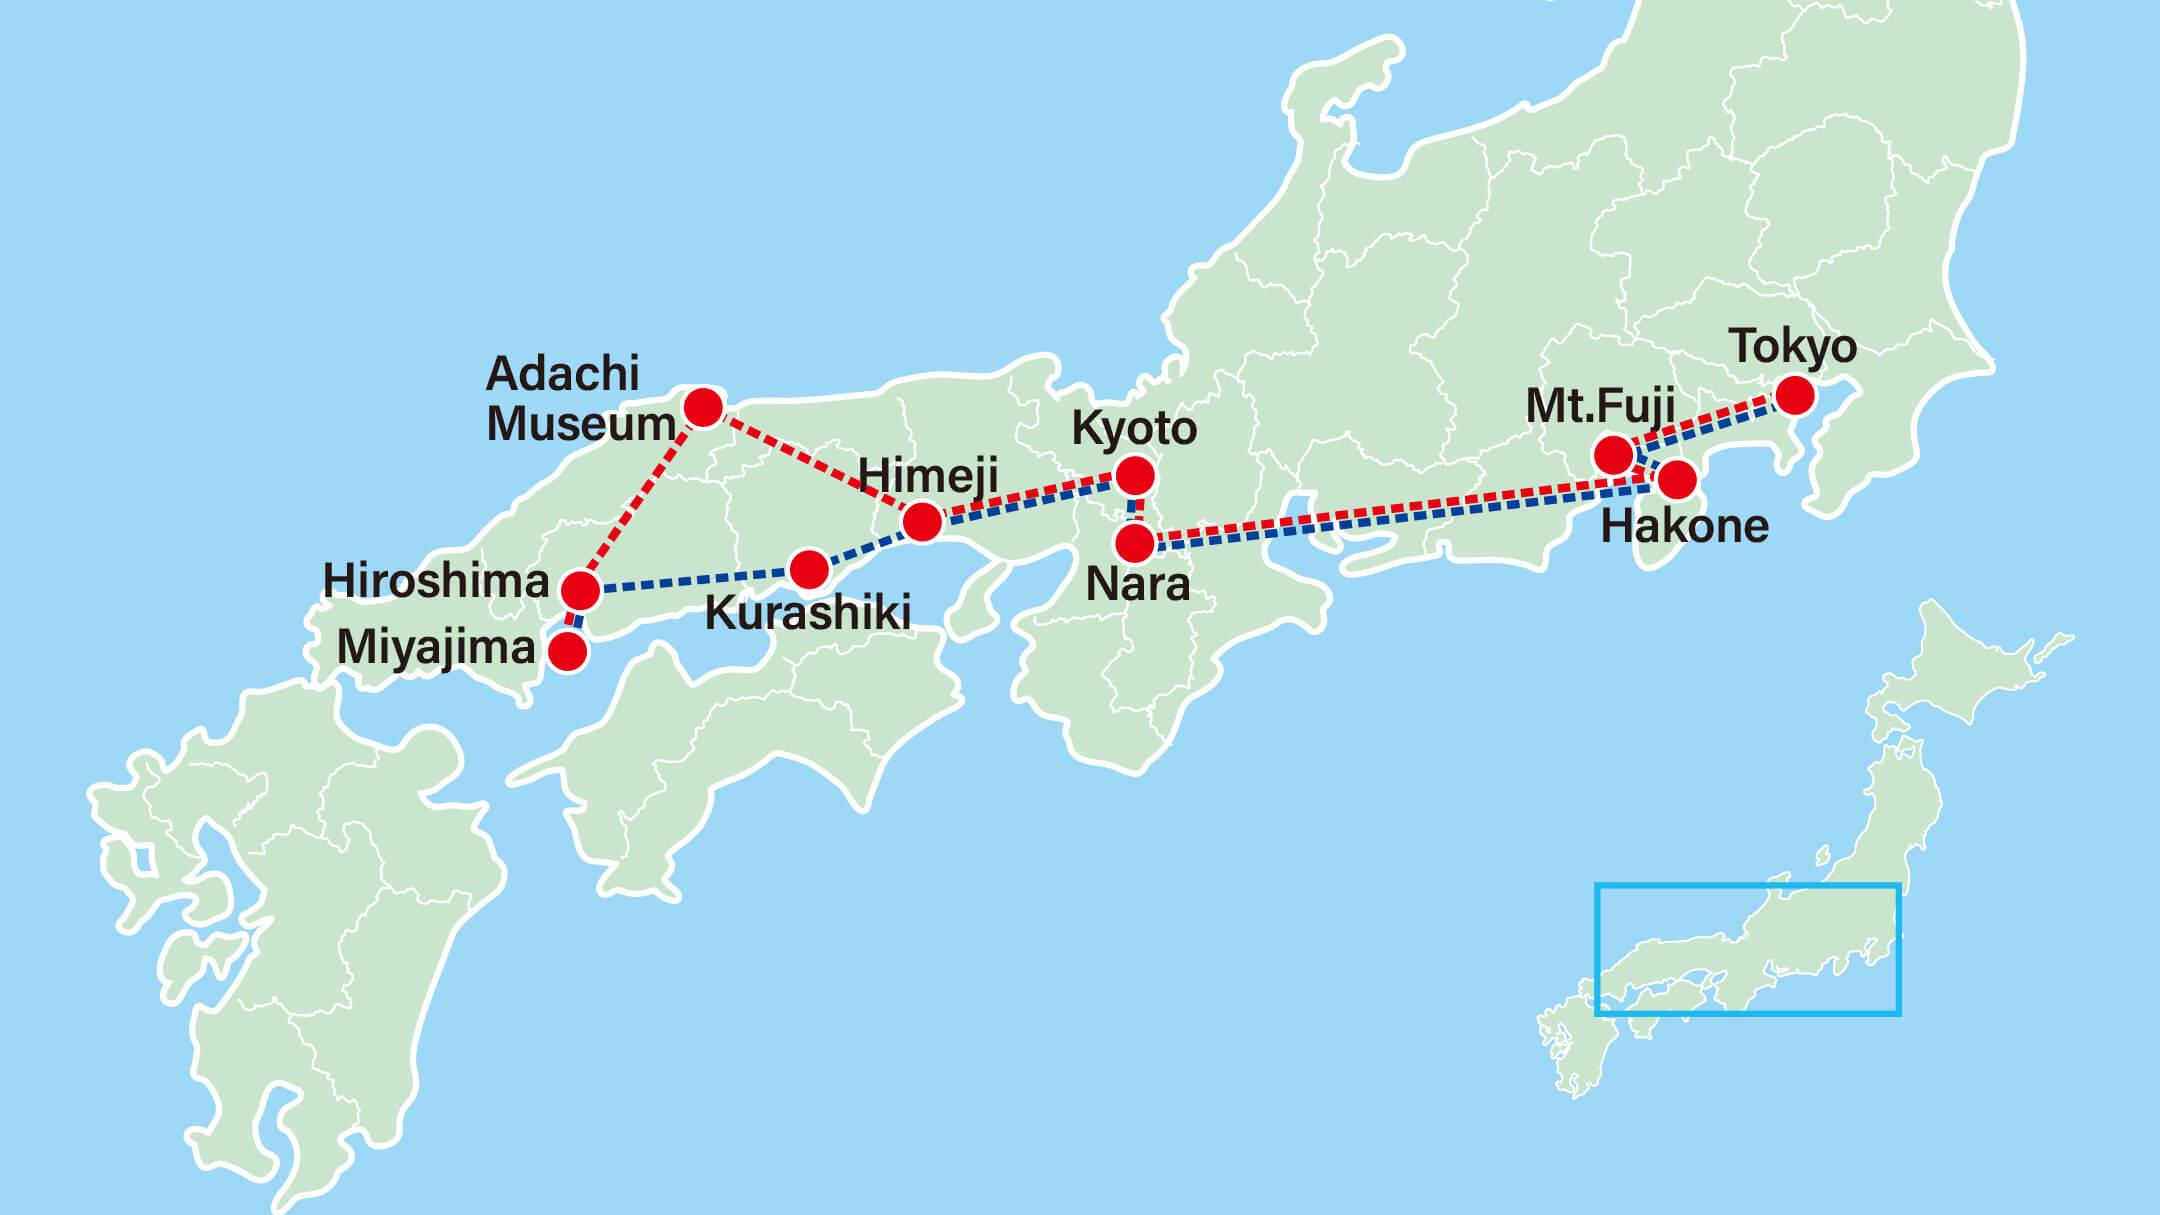 9 Day Japan Highlights Vacation-Kyoto-Kurashiki-Hiroshima-Nara-Mt Fuji-Hakone-Tokyo